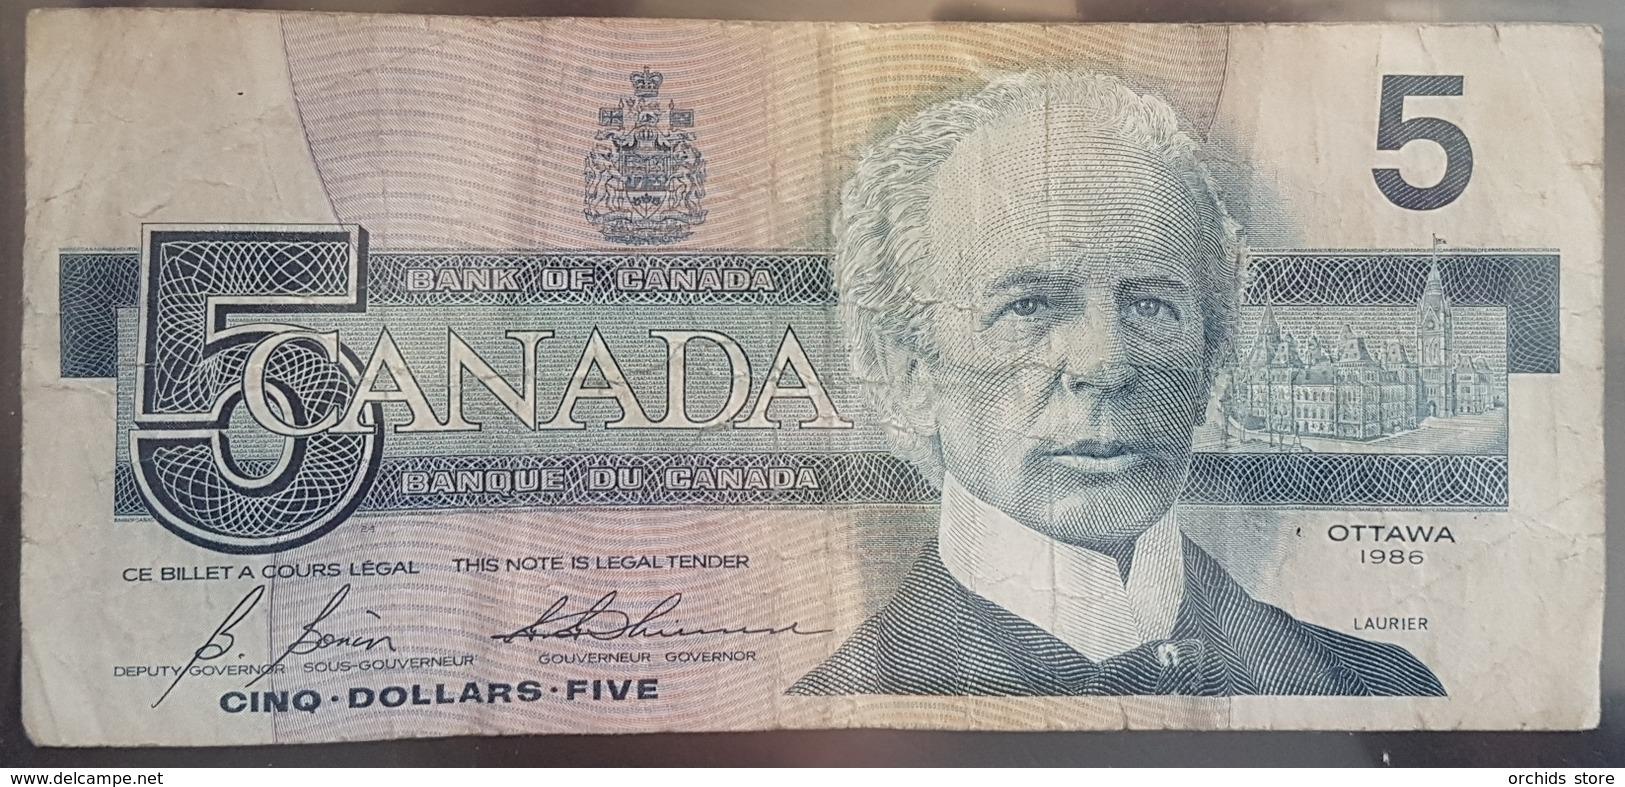 EBN6 - Canada 1986 Banknote 5 Dollars Pick 95c - Canada